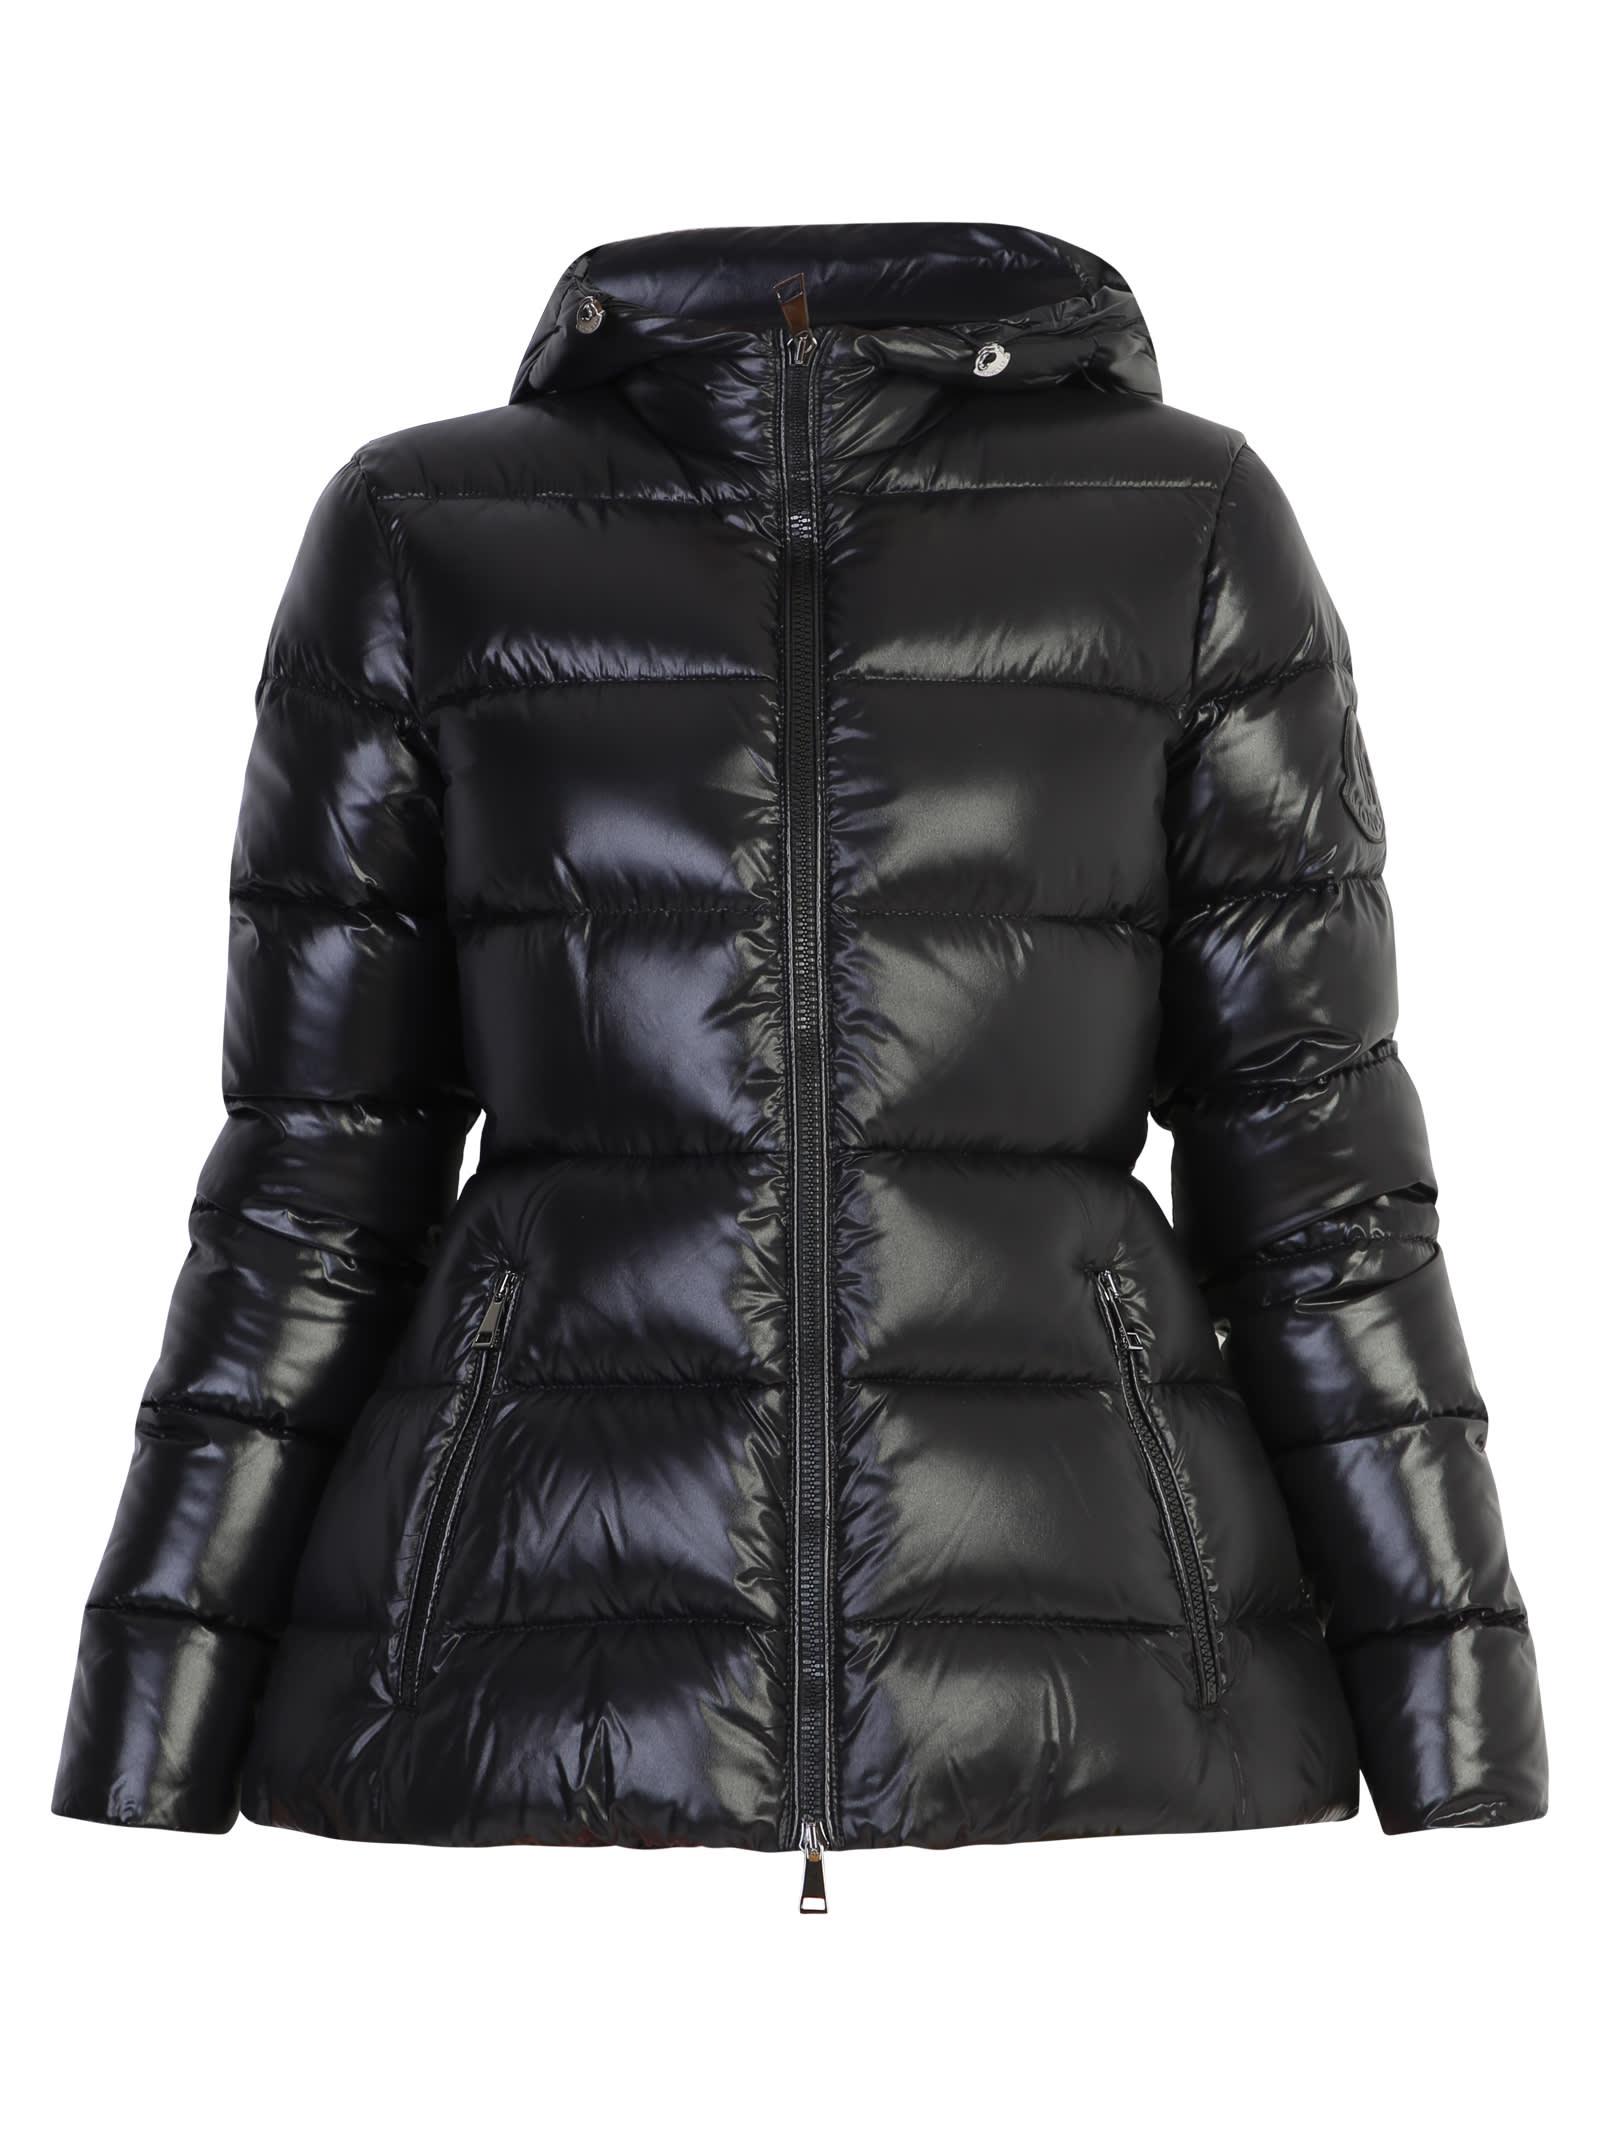 Photo of  Moncler Rhin Padded Jacket- shop Moncler jackets online sales